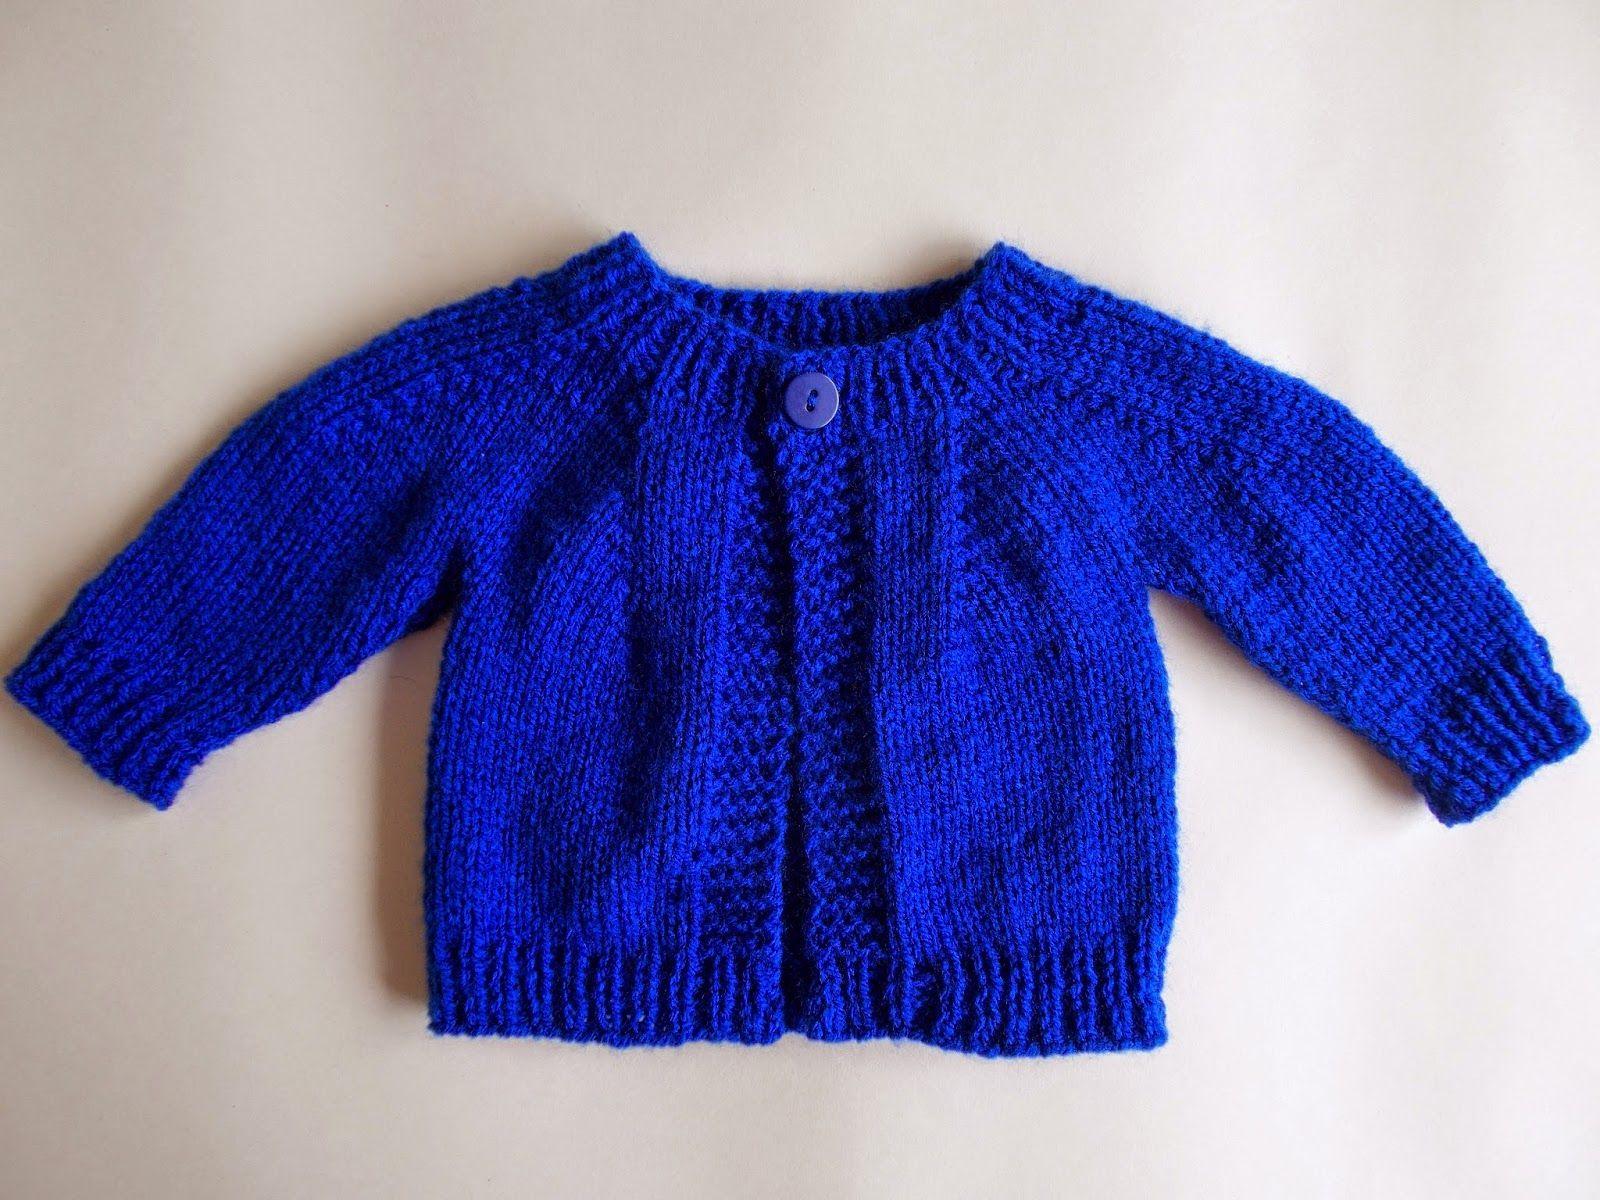 2414034a4 Boy or Girl Top Down Baby Jacket (marianna s lazy daisy days ...